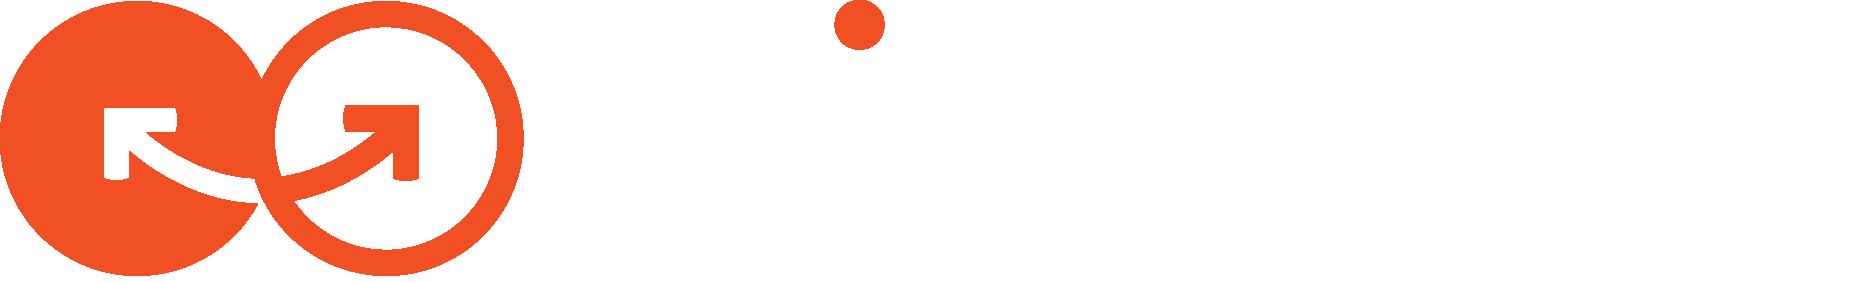 Pierson logo reversed